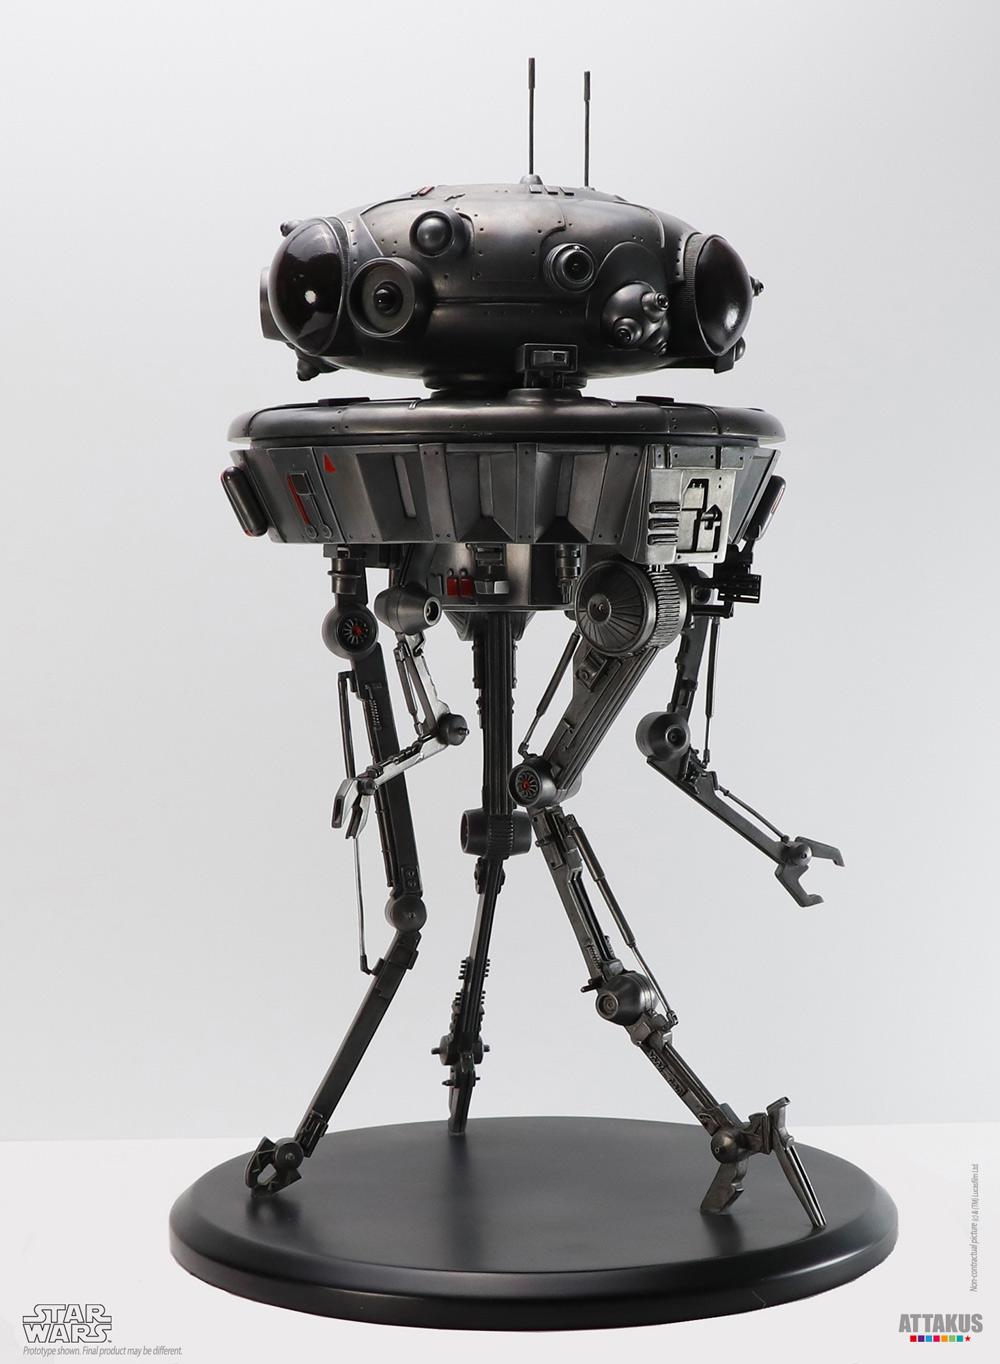 Probe Droid Statue Star Wars Elite Collection 1/10 - ATTAKUS Prode_10